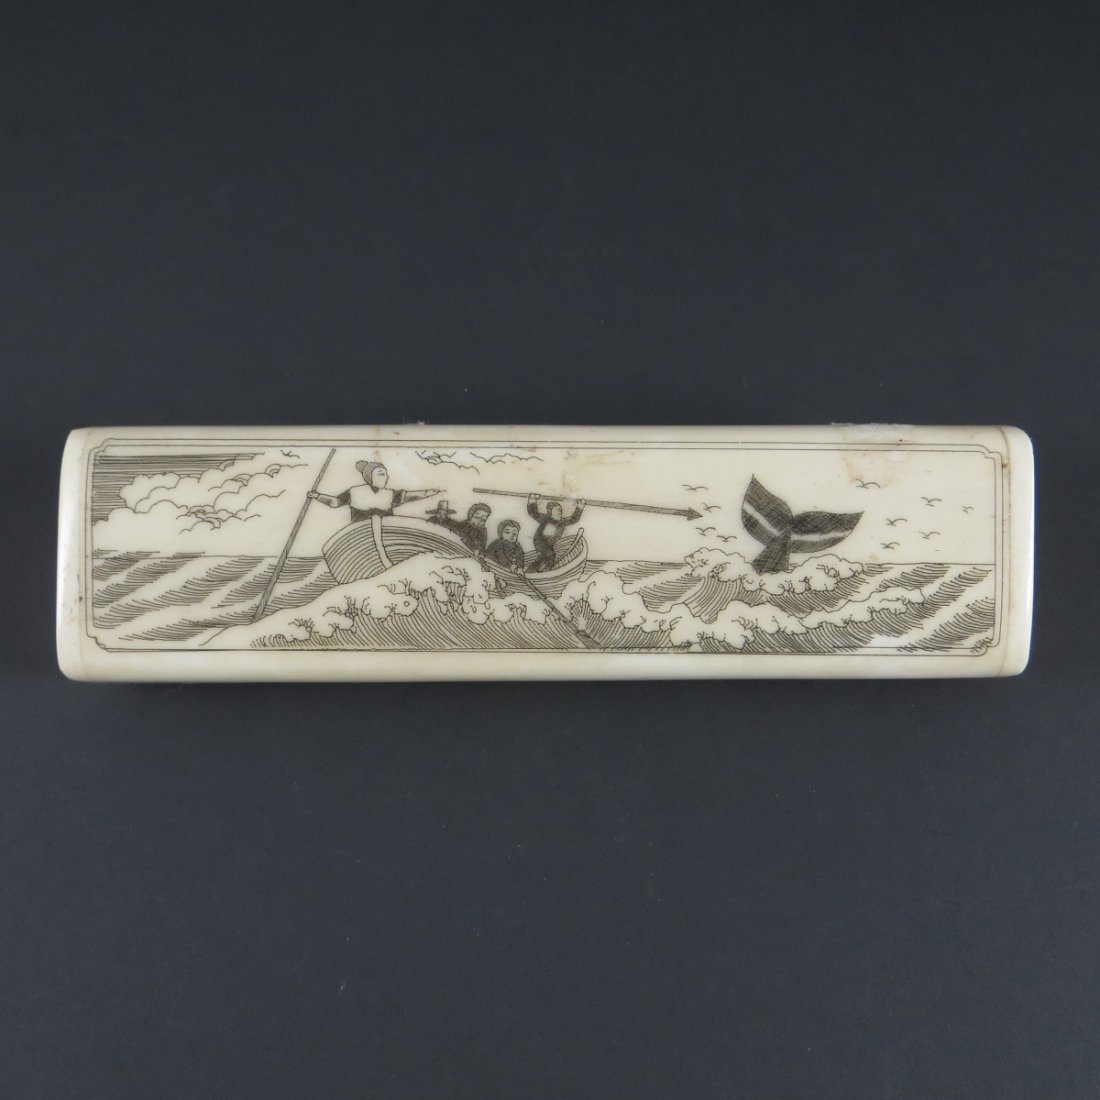 Chinese Qing Dynasty Bone Box